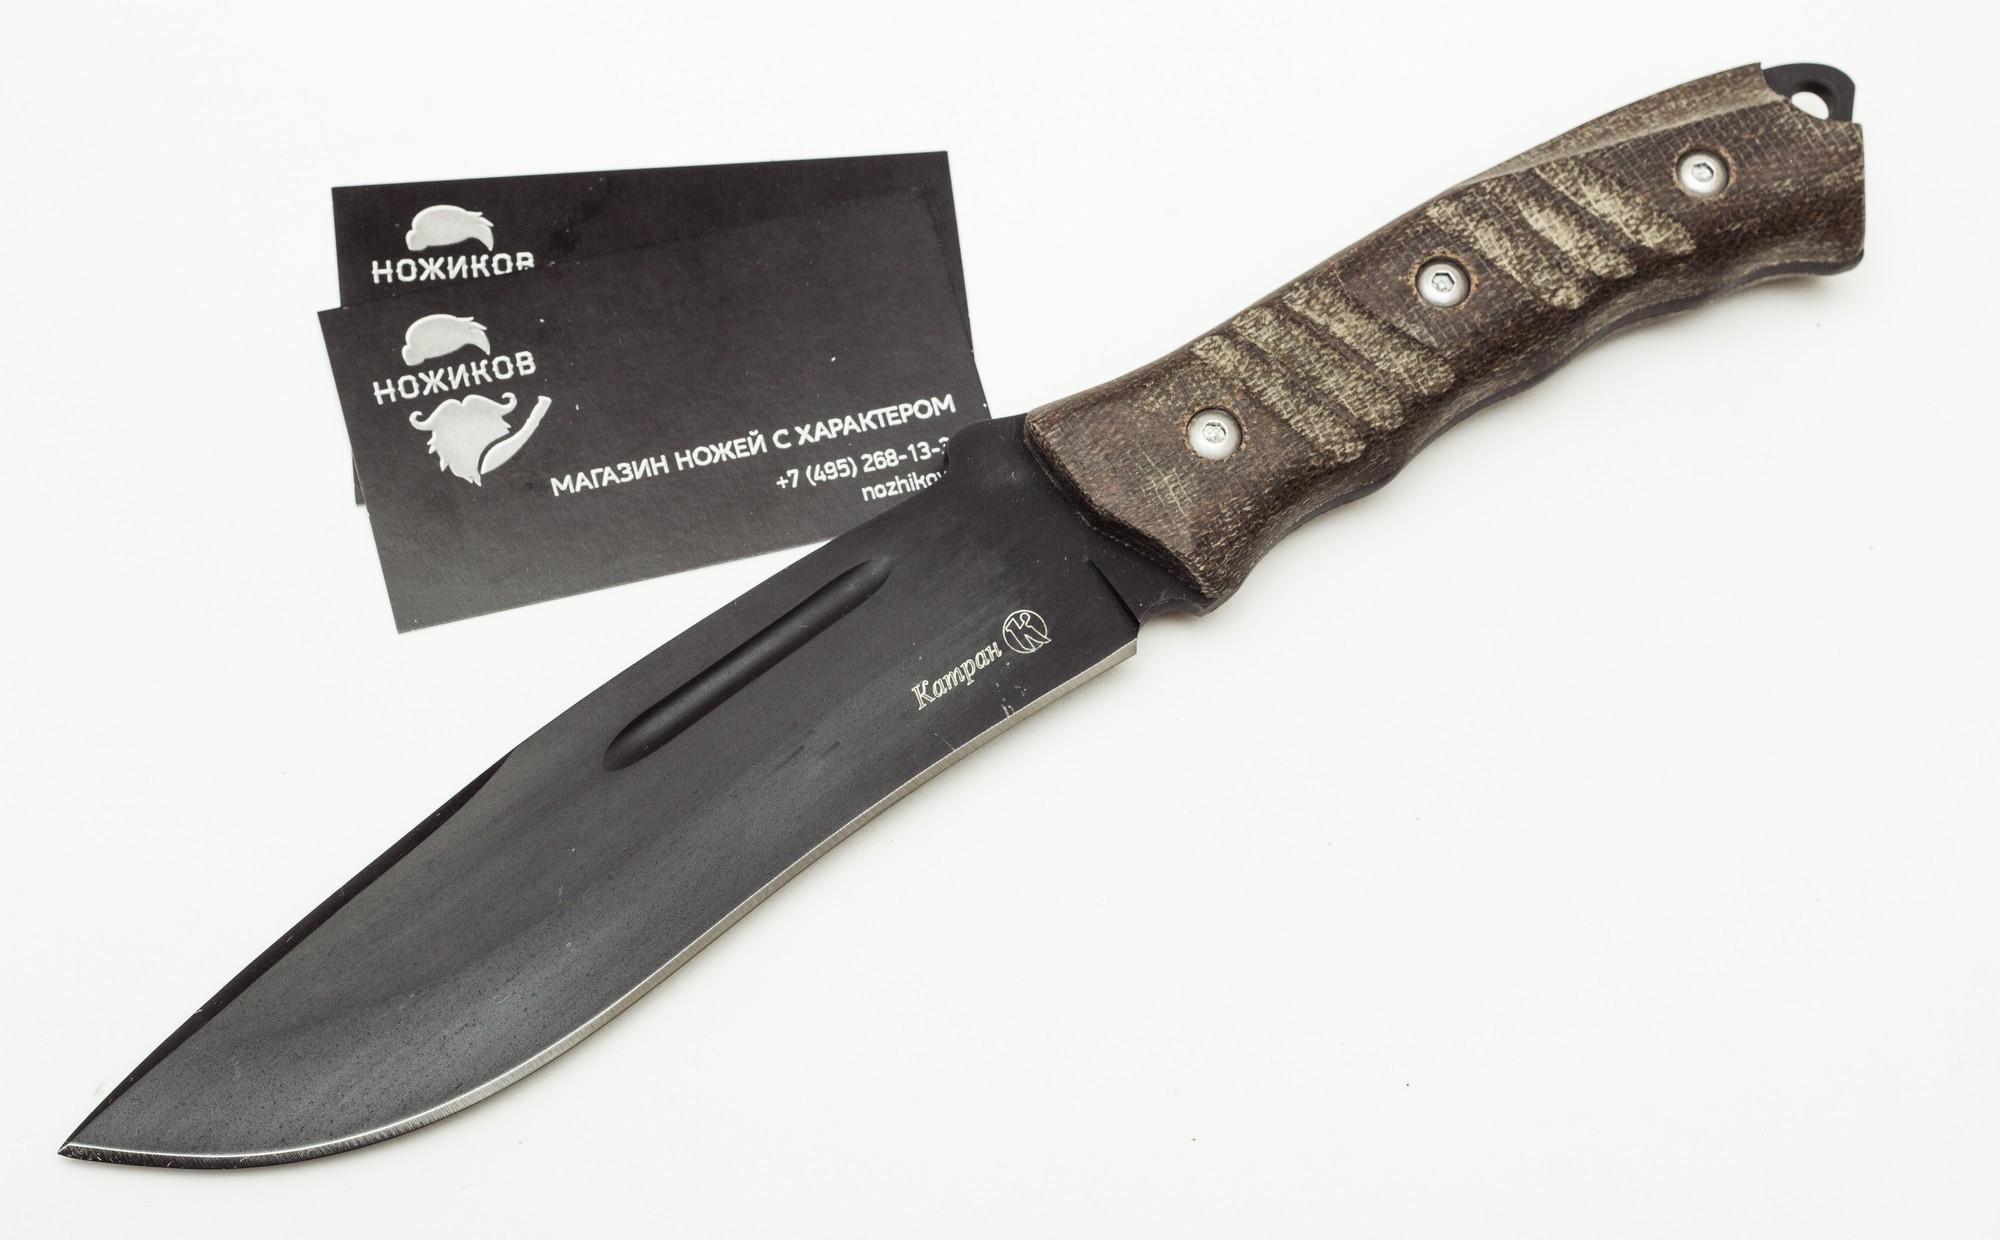 Нож Катран, AUS-8, Кизляр недорого